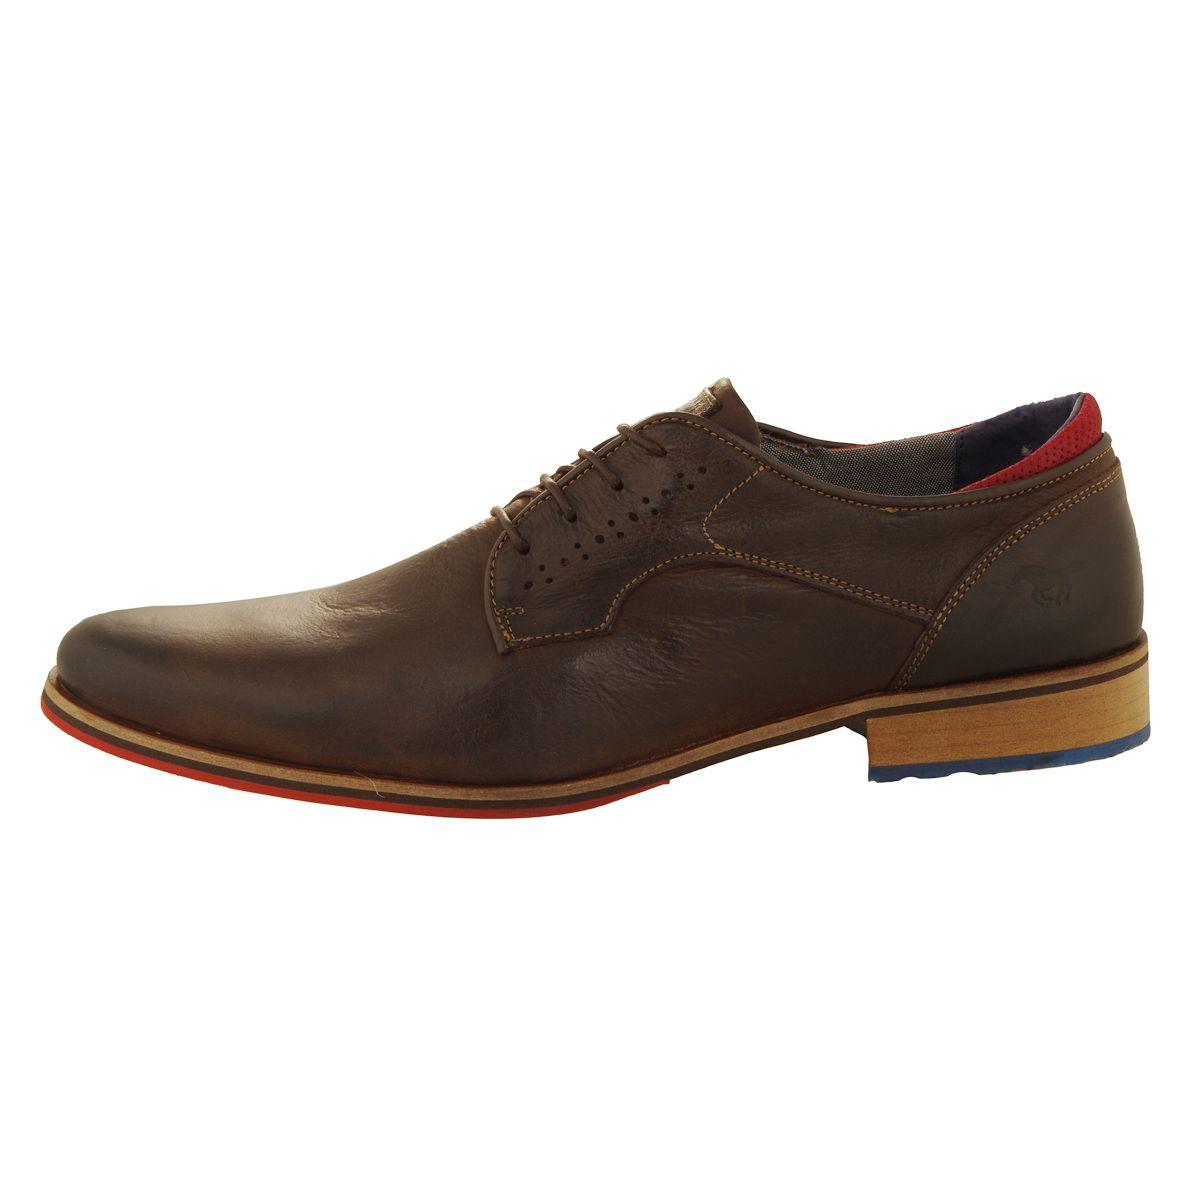 chaussures derby marrons grande taille du 47 au 50 size. Black Bedroom Furniture Sets. Home Design Ideas